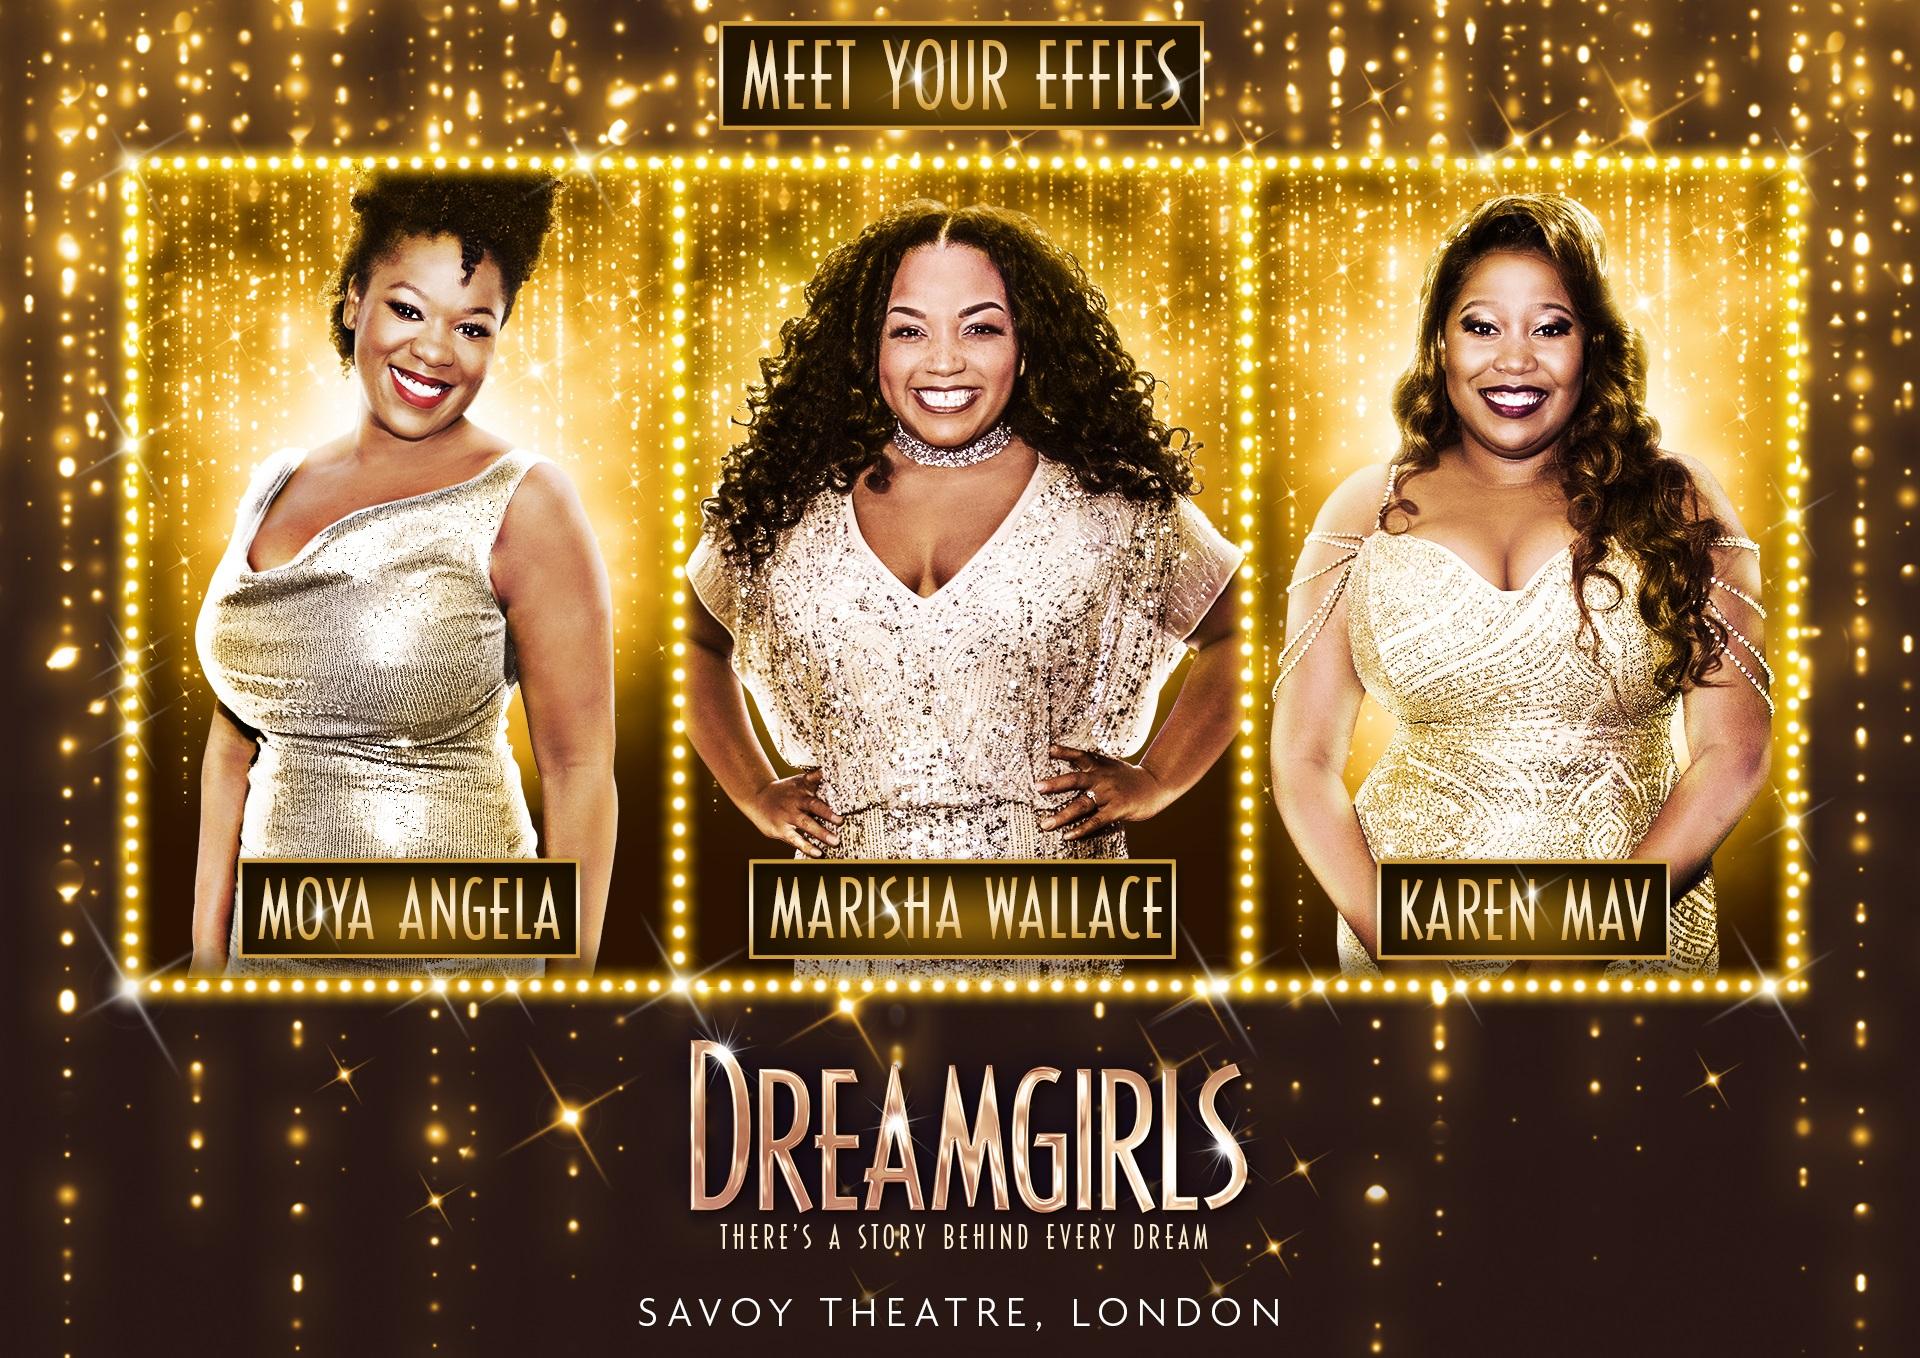 Dreamgirls-Effie-casting-Moya-Angela-Marisha-Wallace-Karen-Mav.jpg